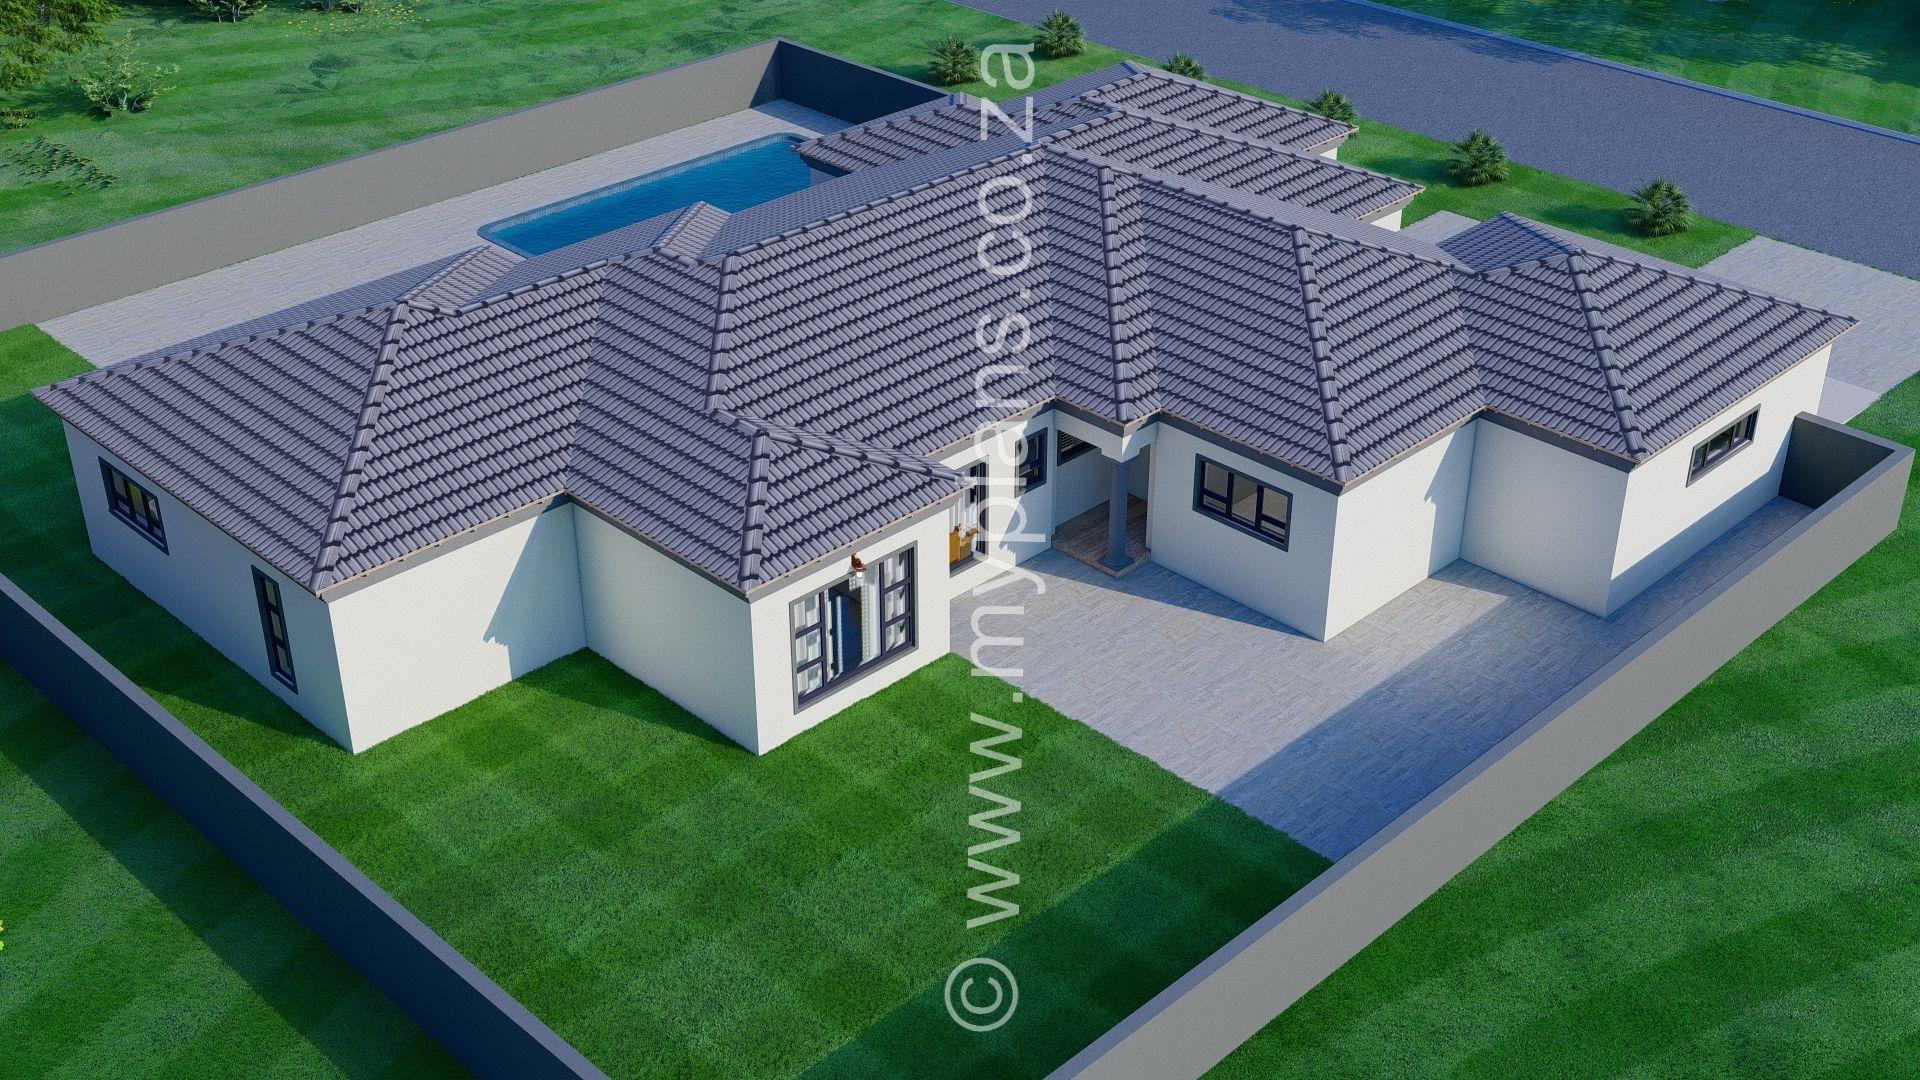 4 Bedroom House Plan Mlb 025s 4 Bedroom House Plans Family House Plans My House Plans